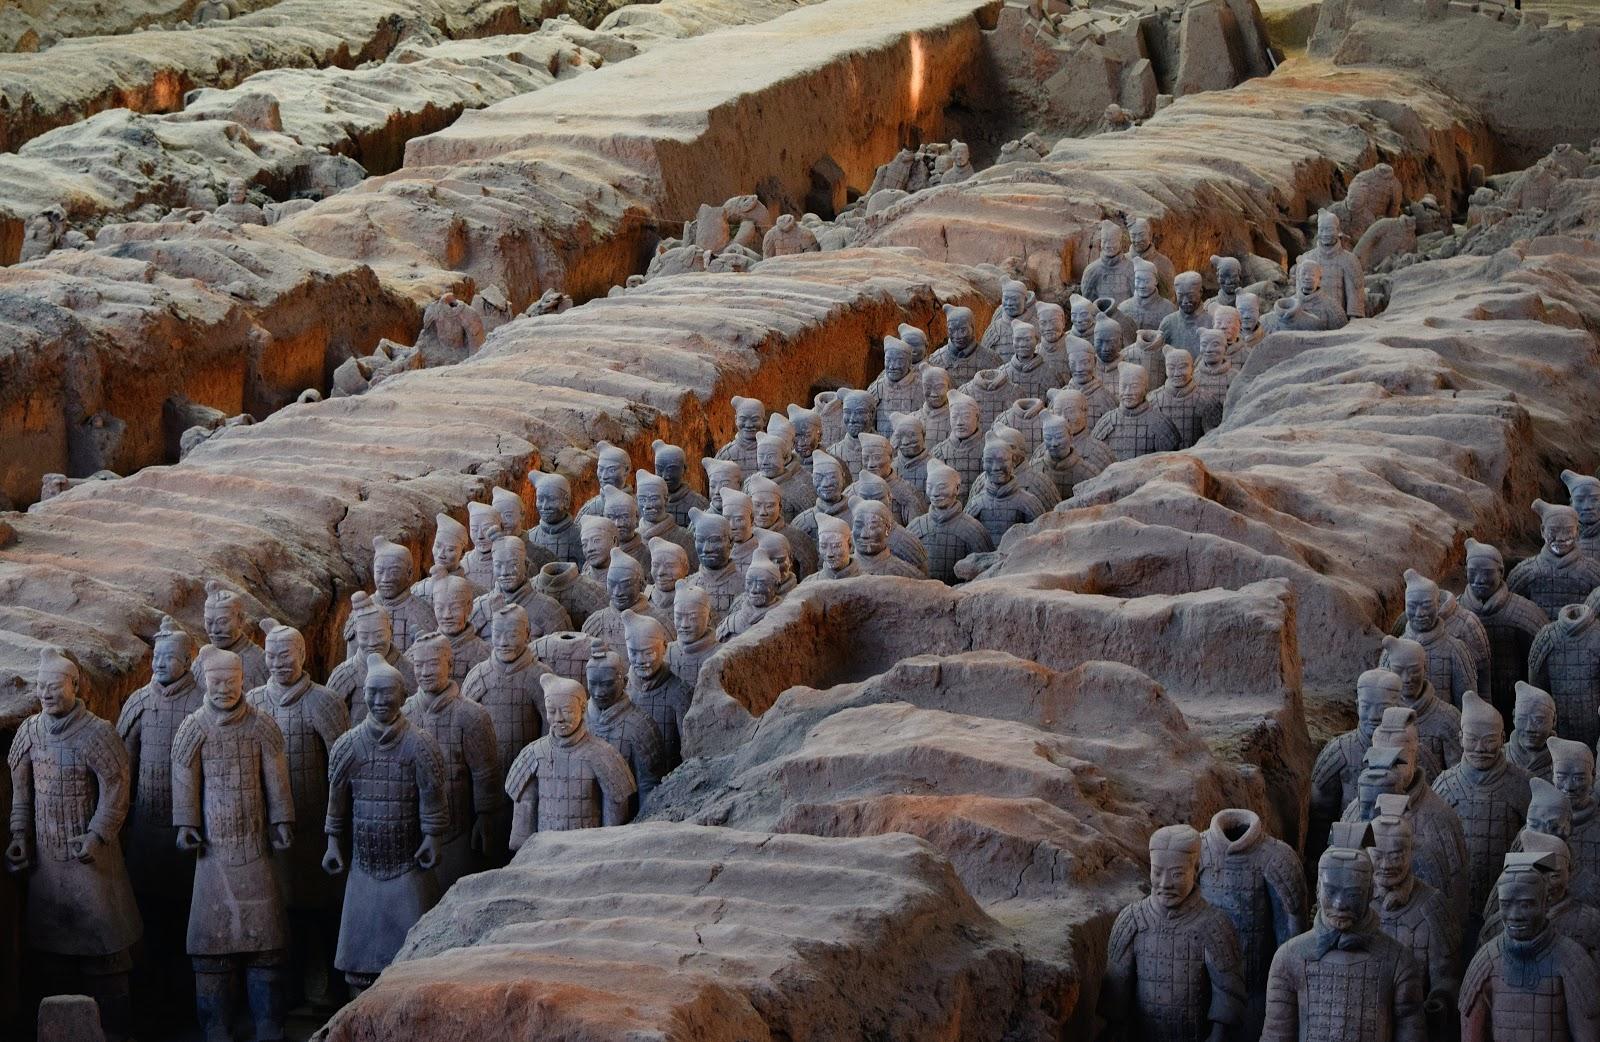 The Terracotta Army   Source: unsplash.com